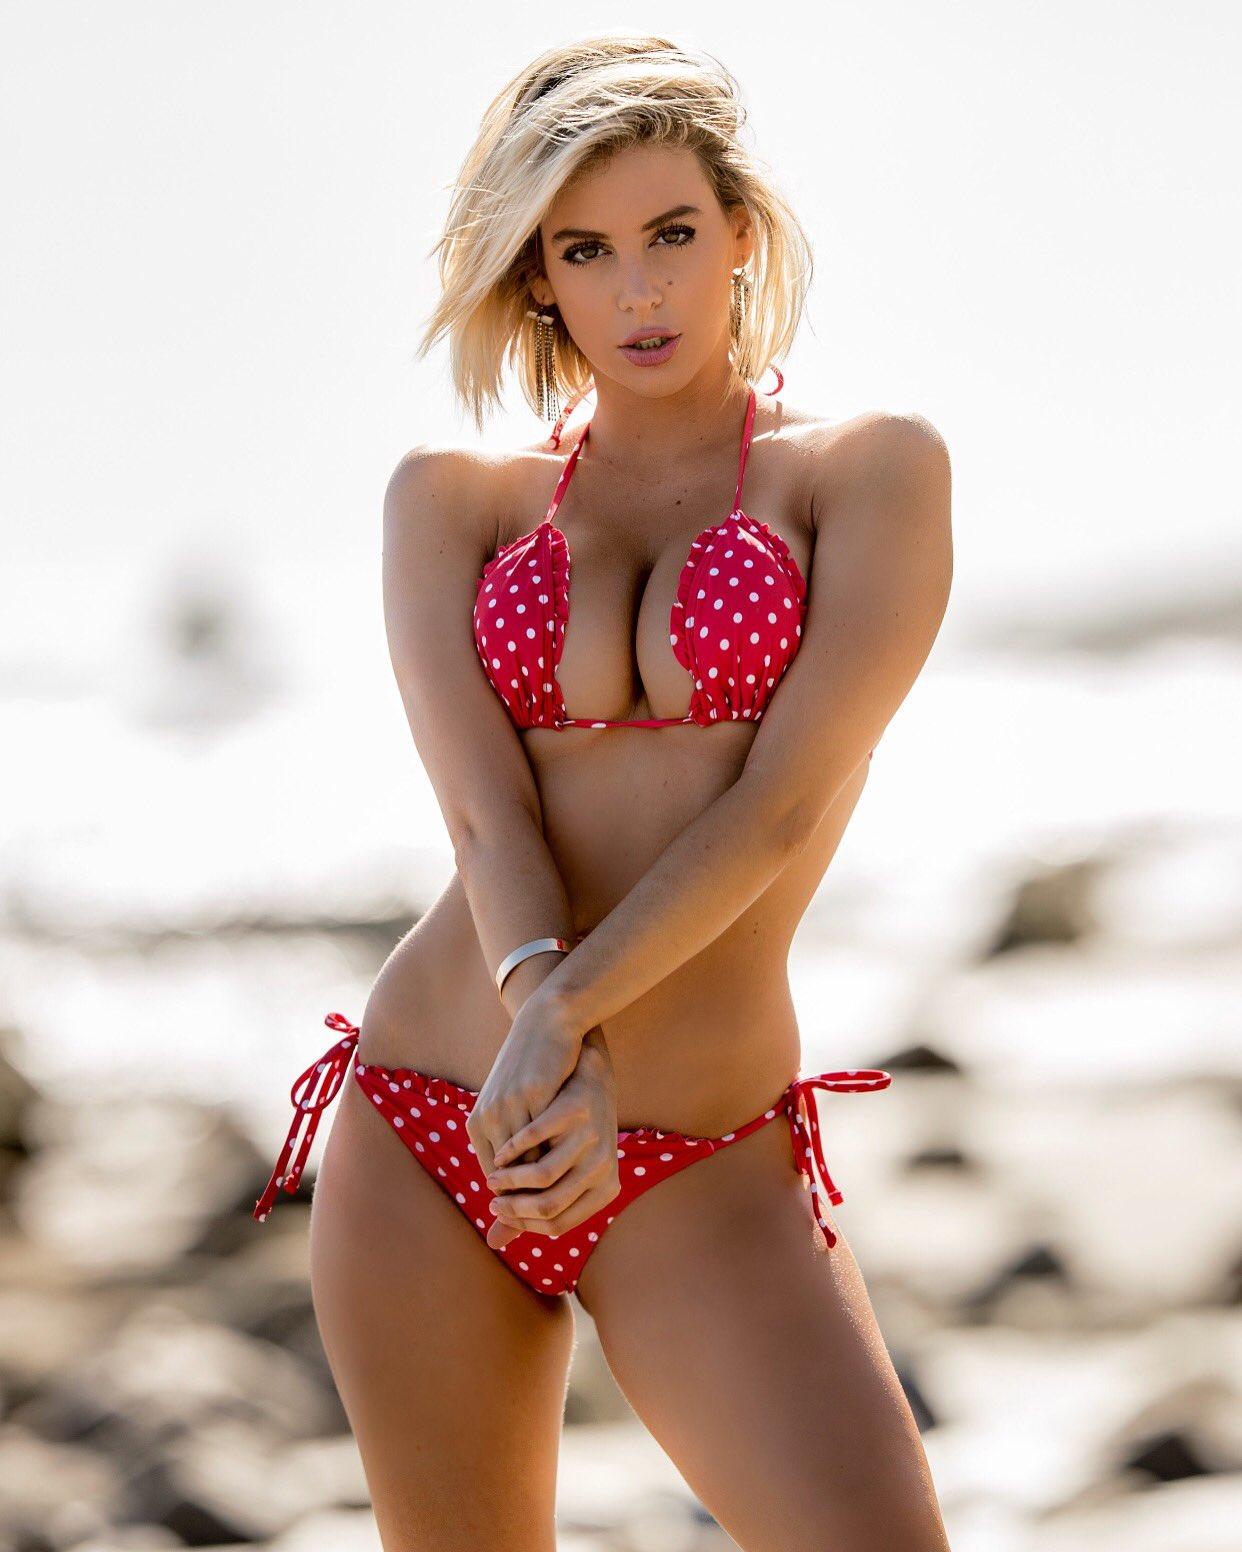 Fondos de pantalla : Bri Teresi, rubia, mujer, bikini ...